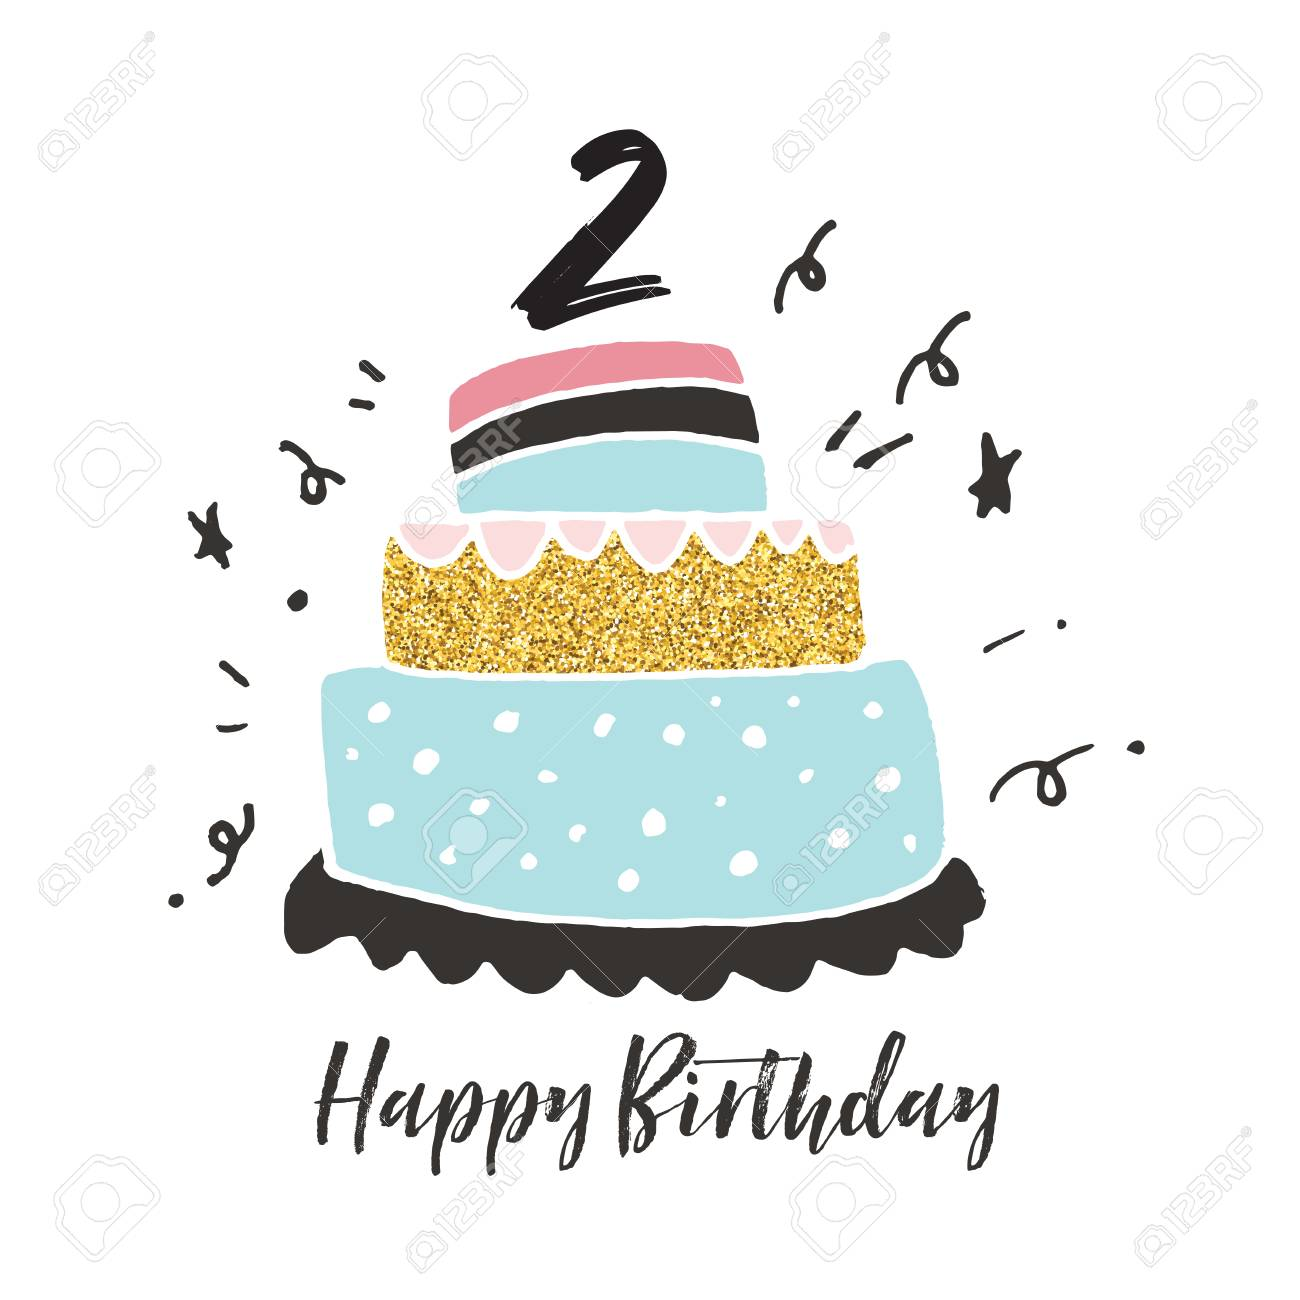 Sensational 2Nd Birthday Hand Drawn Cake Birthday Card Stock Photo Picture Funny Birthday Cards Online Elaedamsfinfo